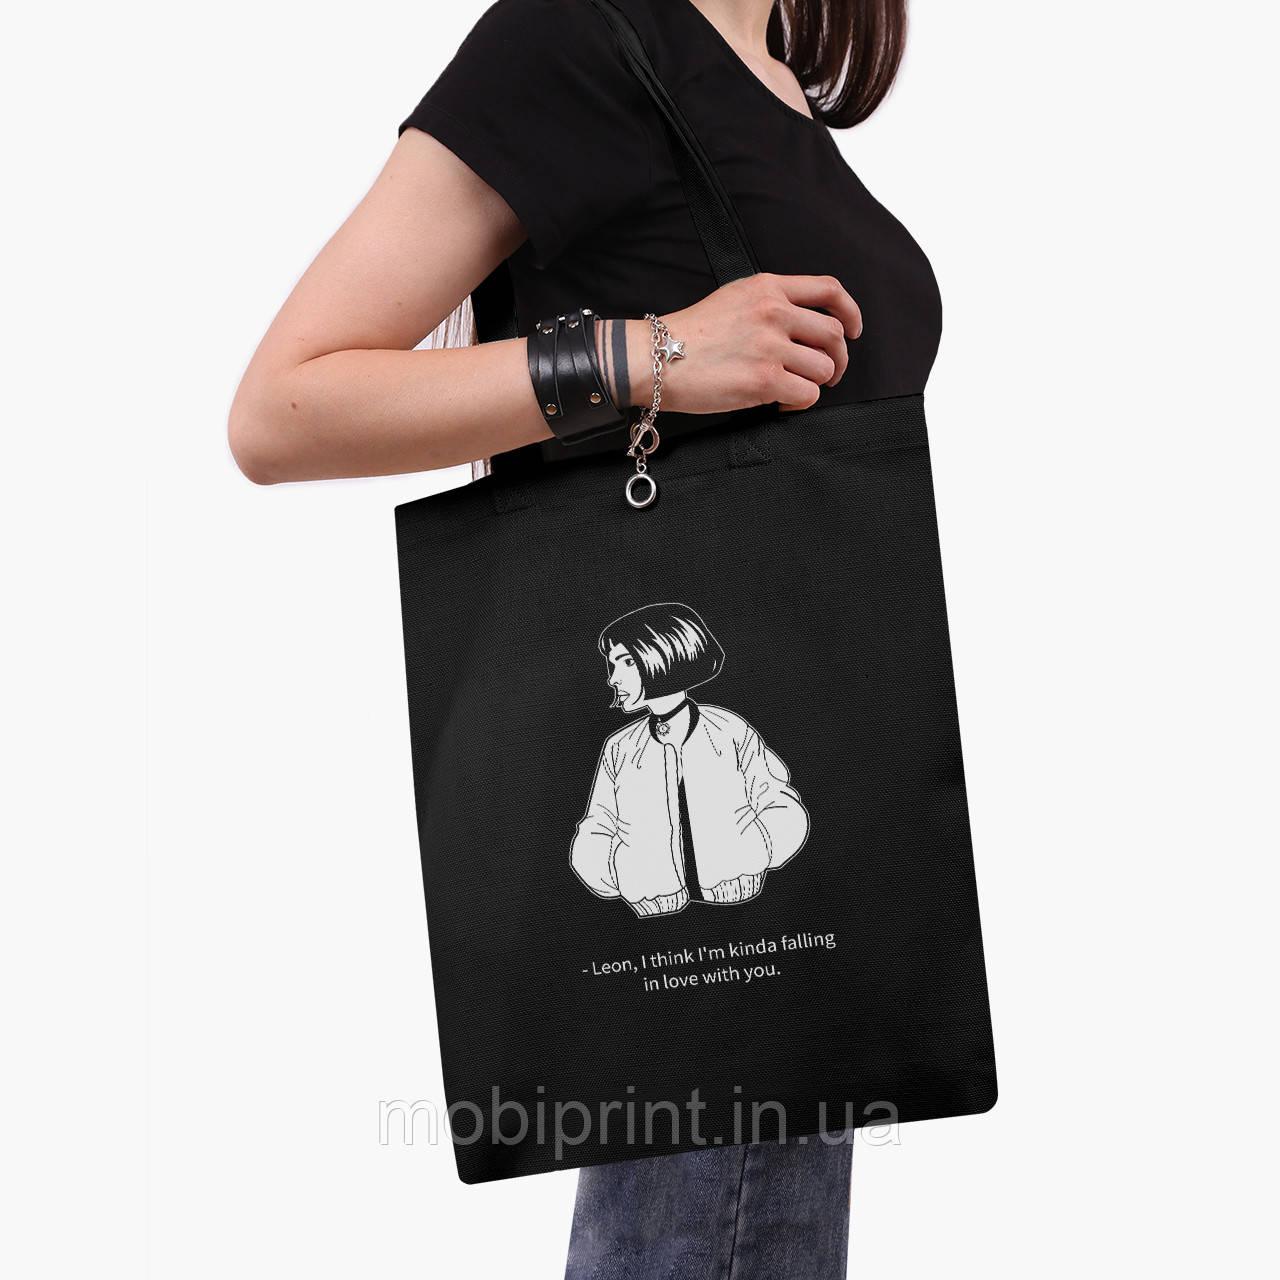 Эко сумка шоппер черная Леон киллер (Leon) (9227-1452-2)  экосумка шопер 41*35 см